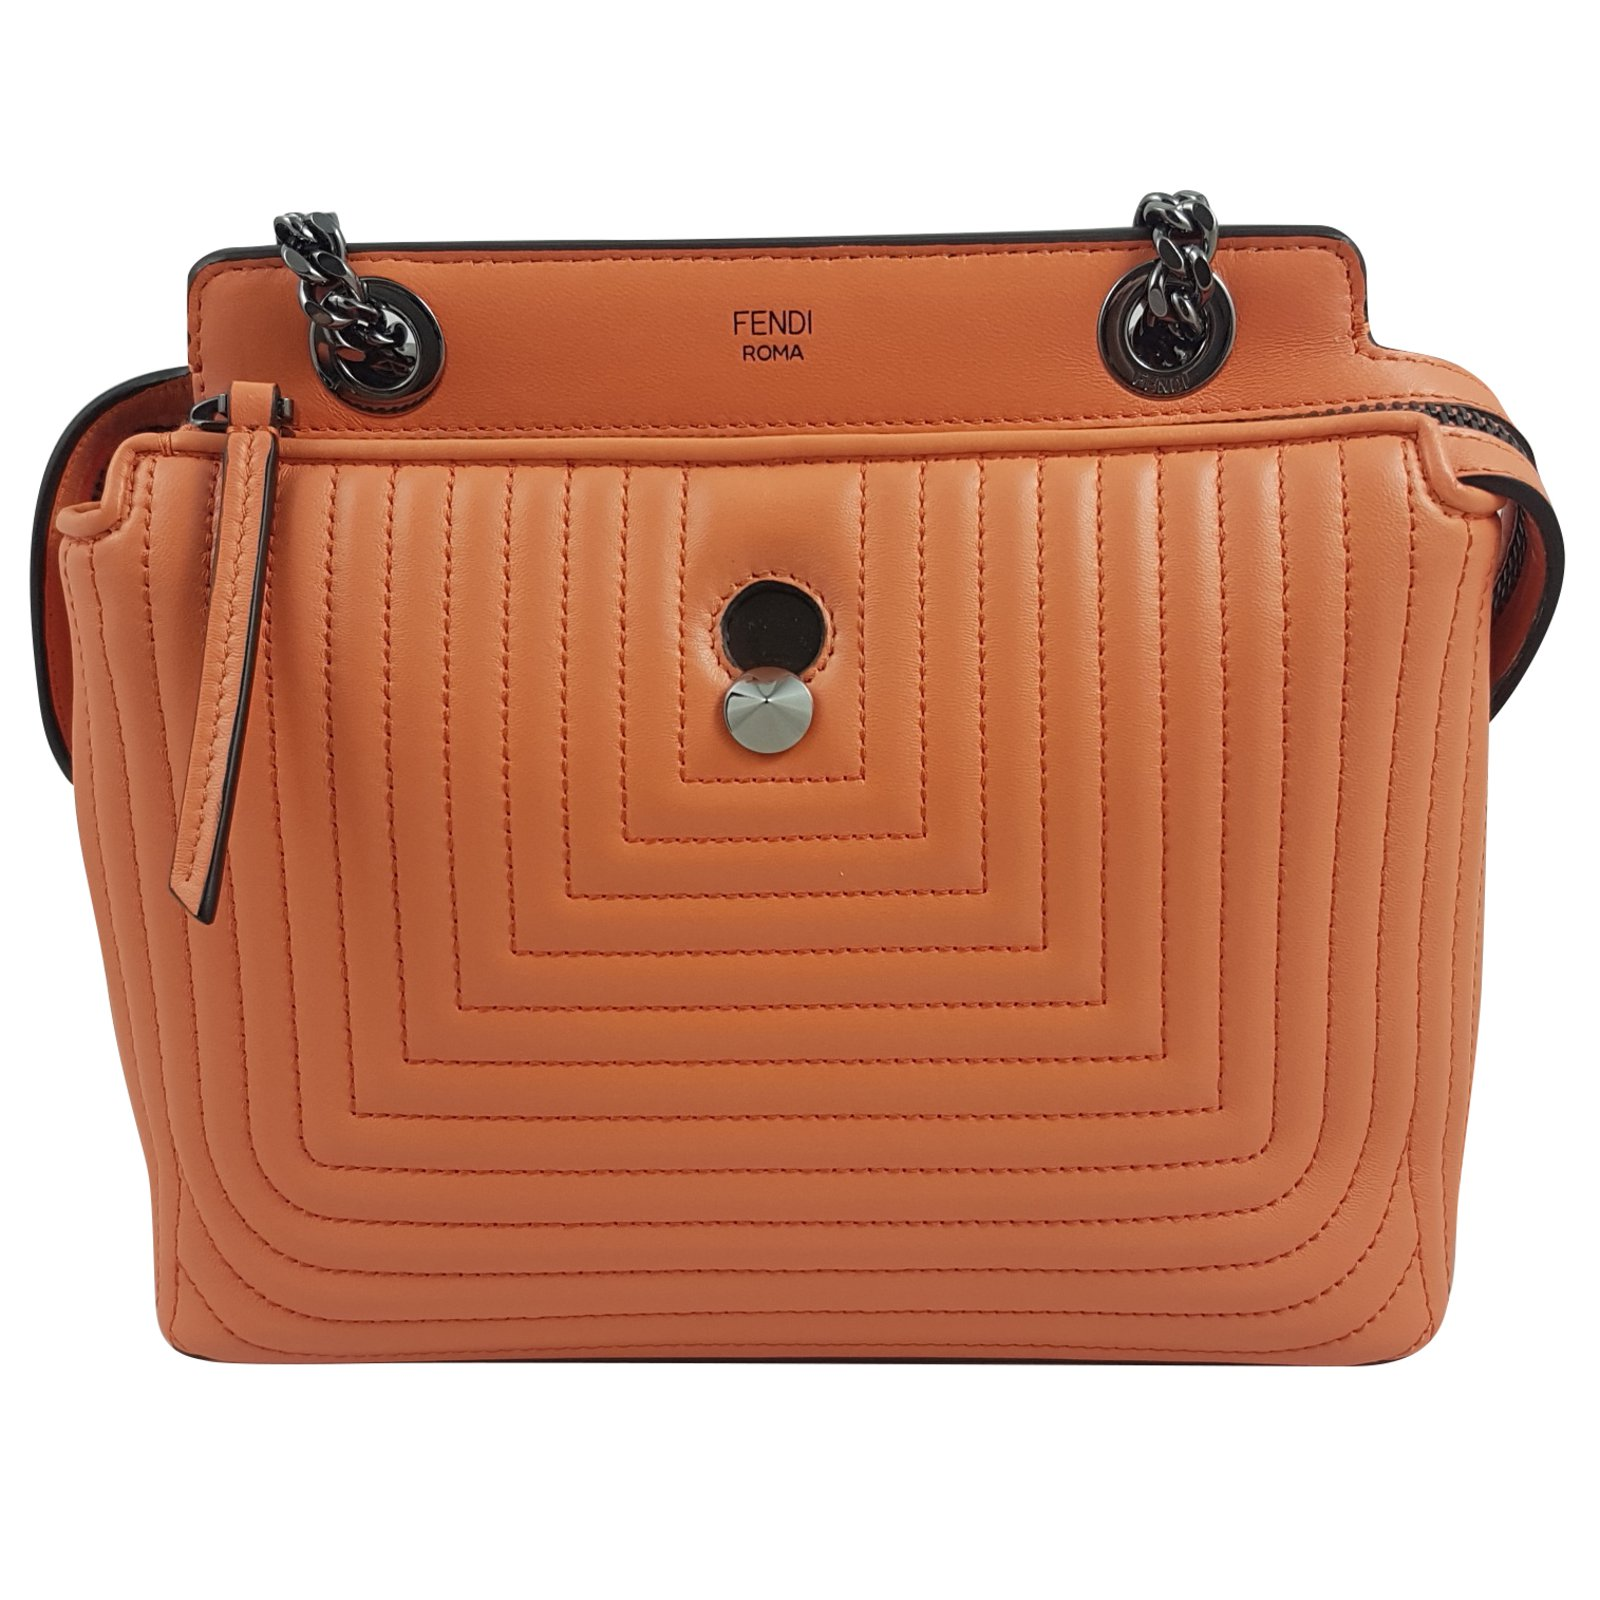 handbags itm bradley crossbody emma vera leather ebay mini quilted bag quilt